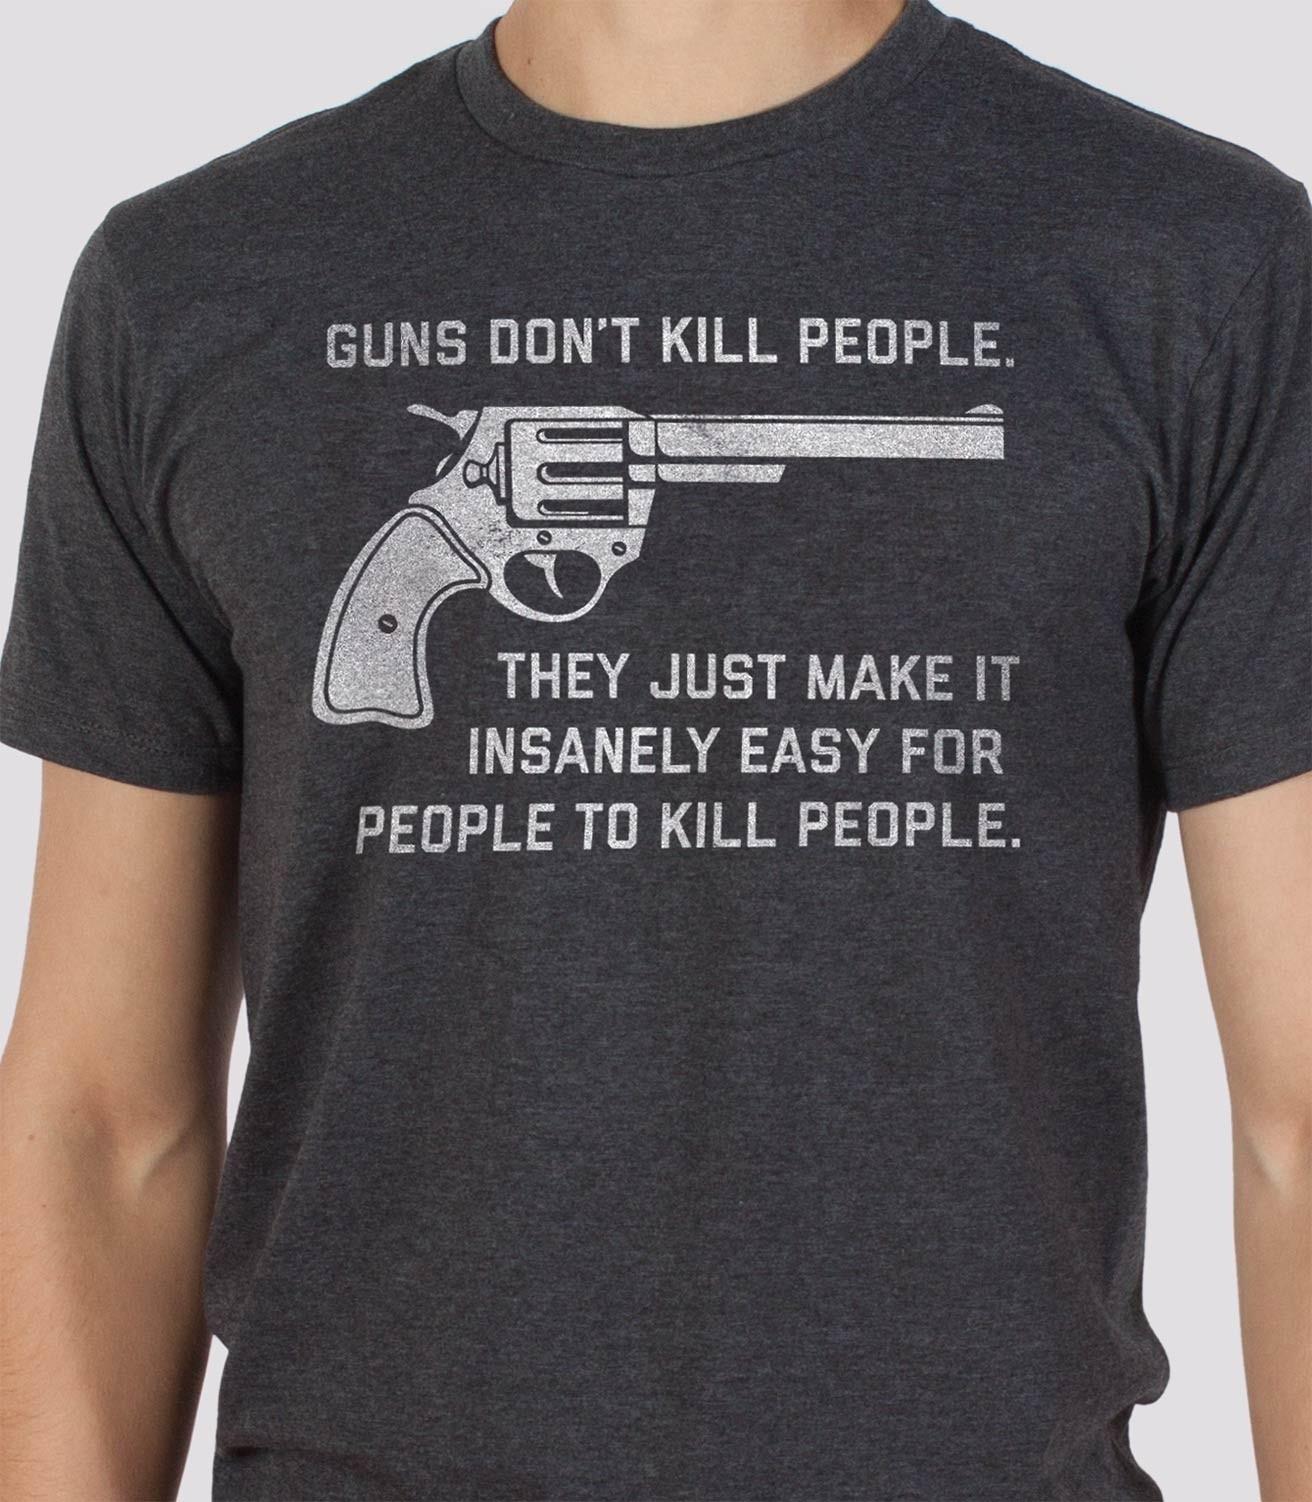 Gun T Shirts >> Guns Don T Kill People Men S Funny Gun Control T Shirt Headline Shirts